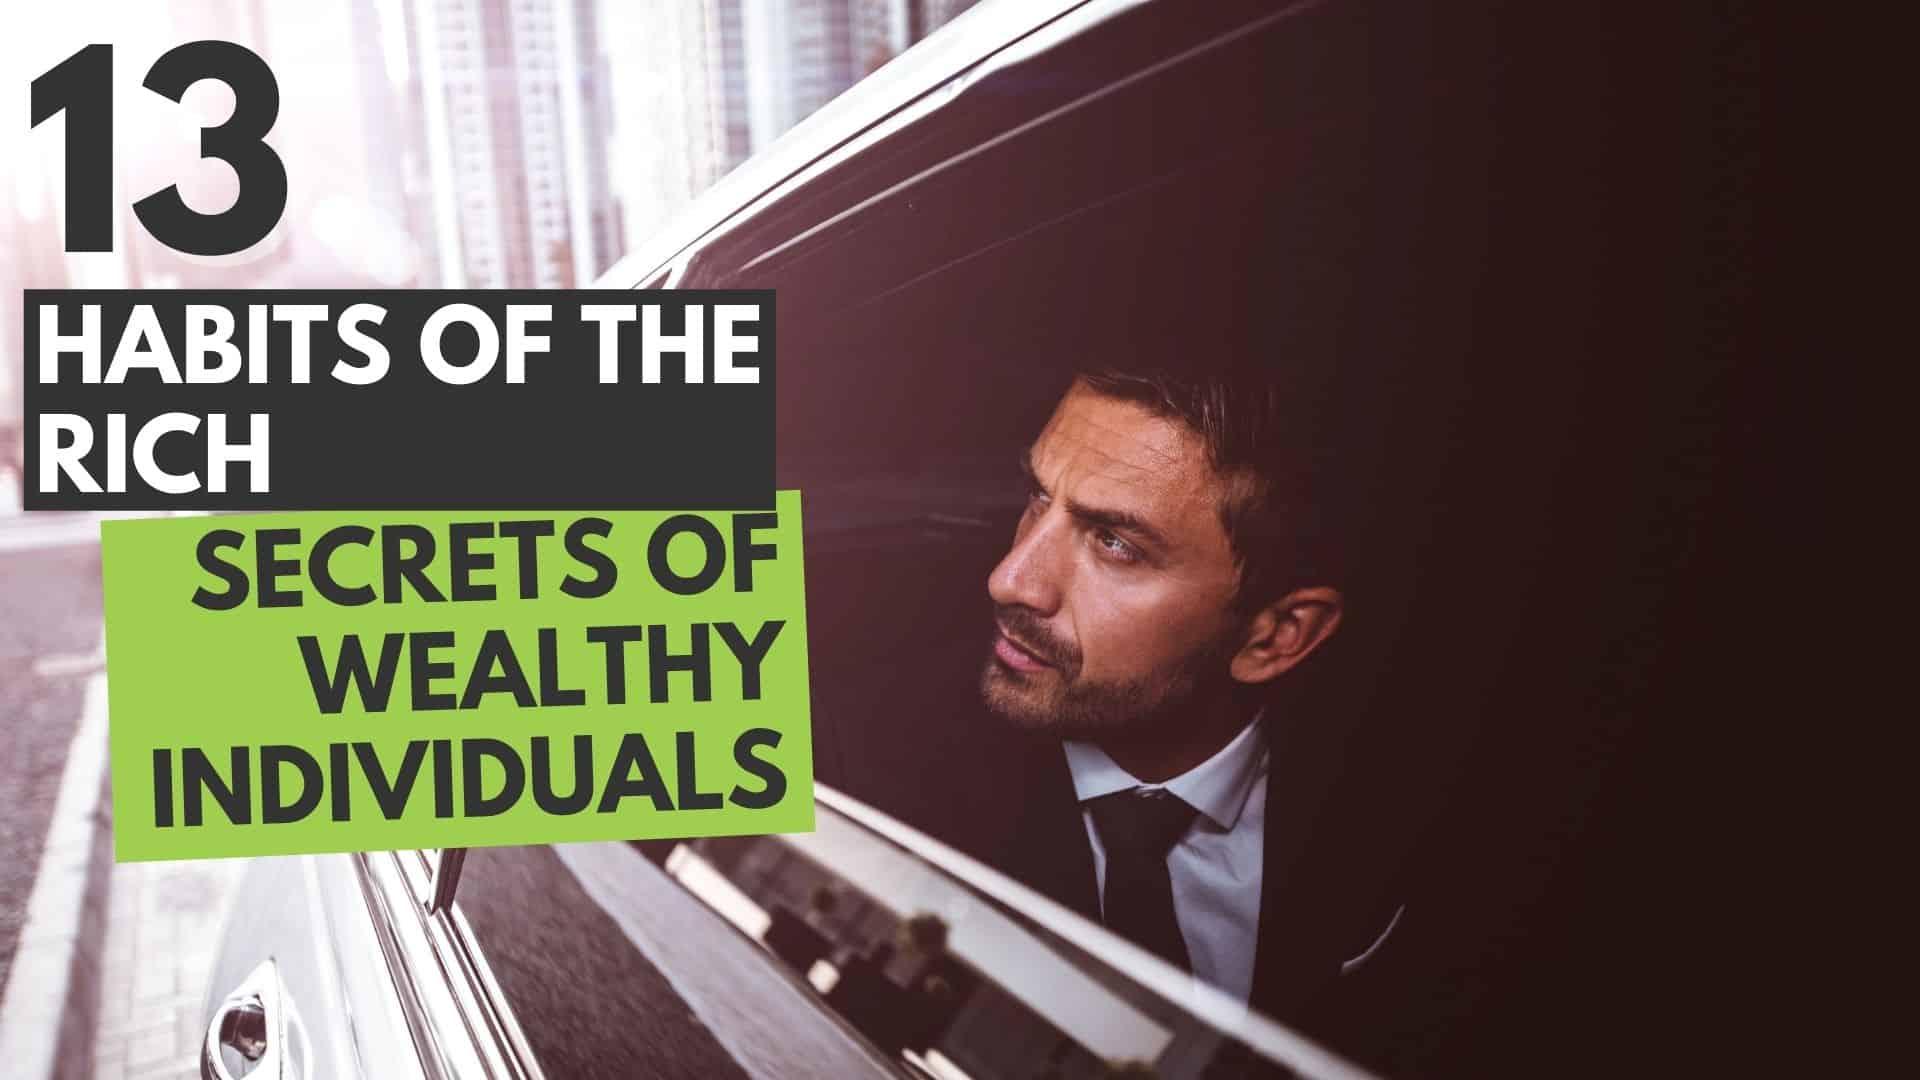 Secrets of the Wealthy: 13 Habits